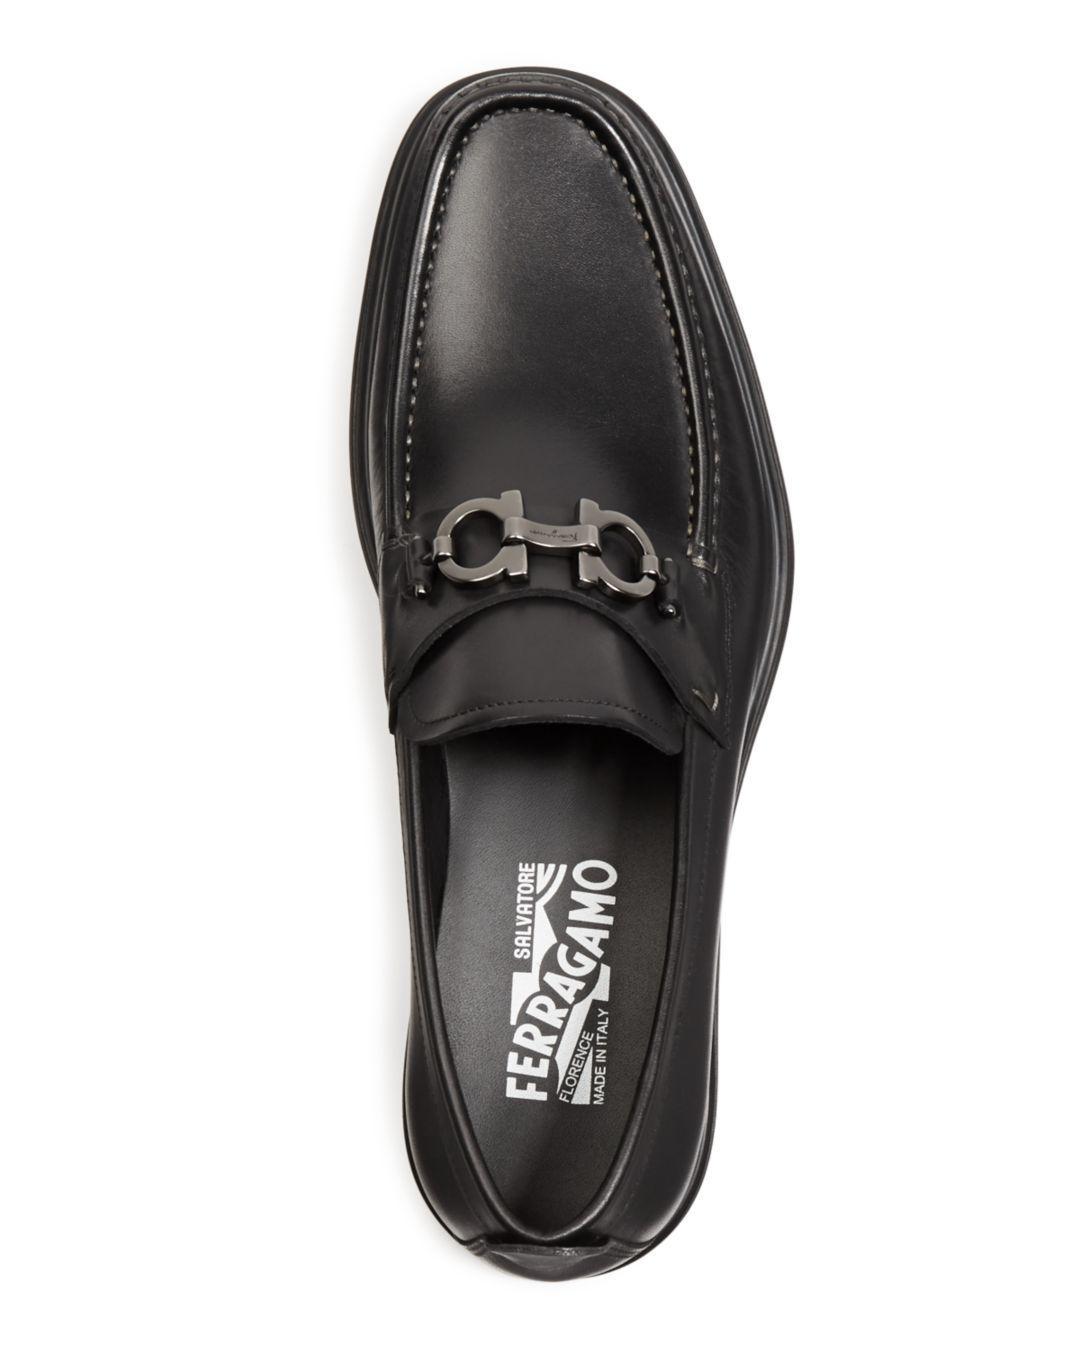 2ed00b7800f Lyst - Ferragamo David Leather Loafers in Black for Men